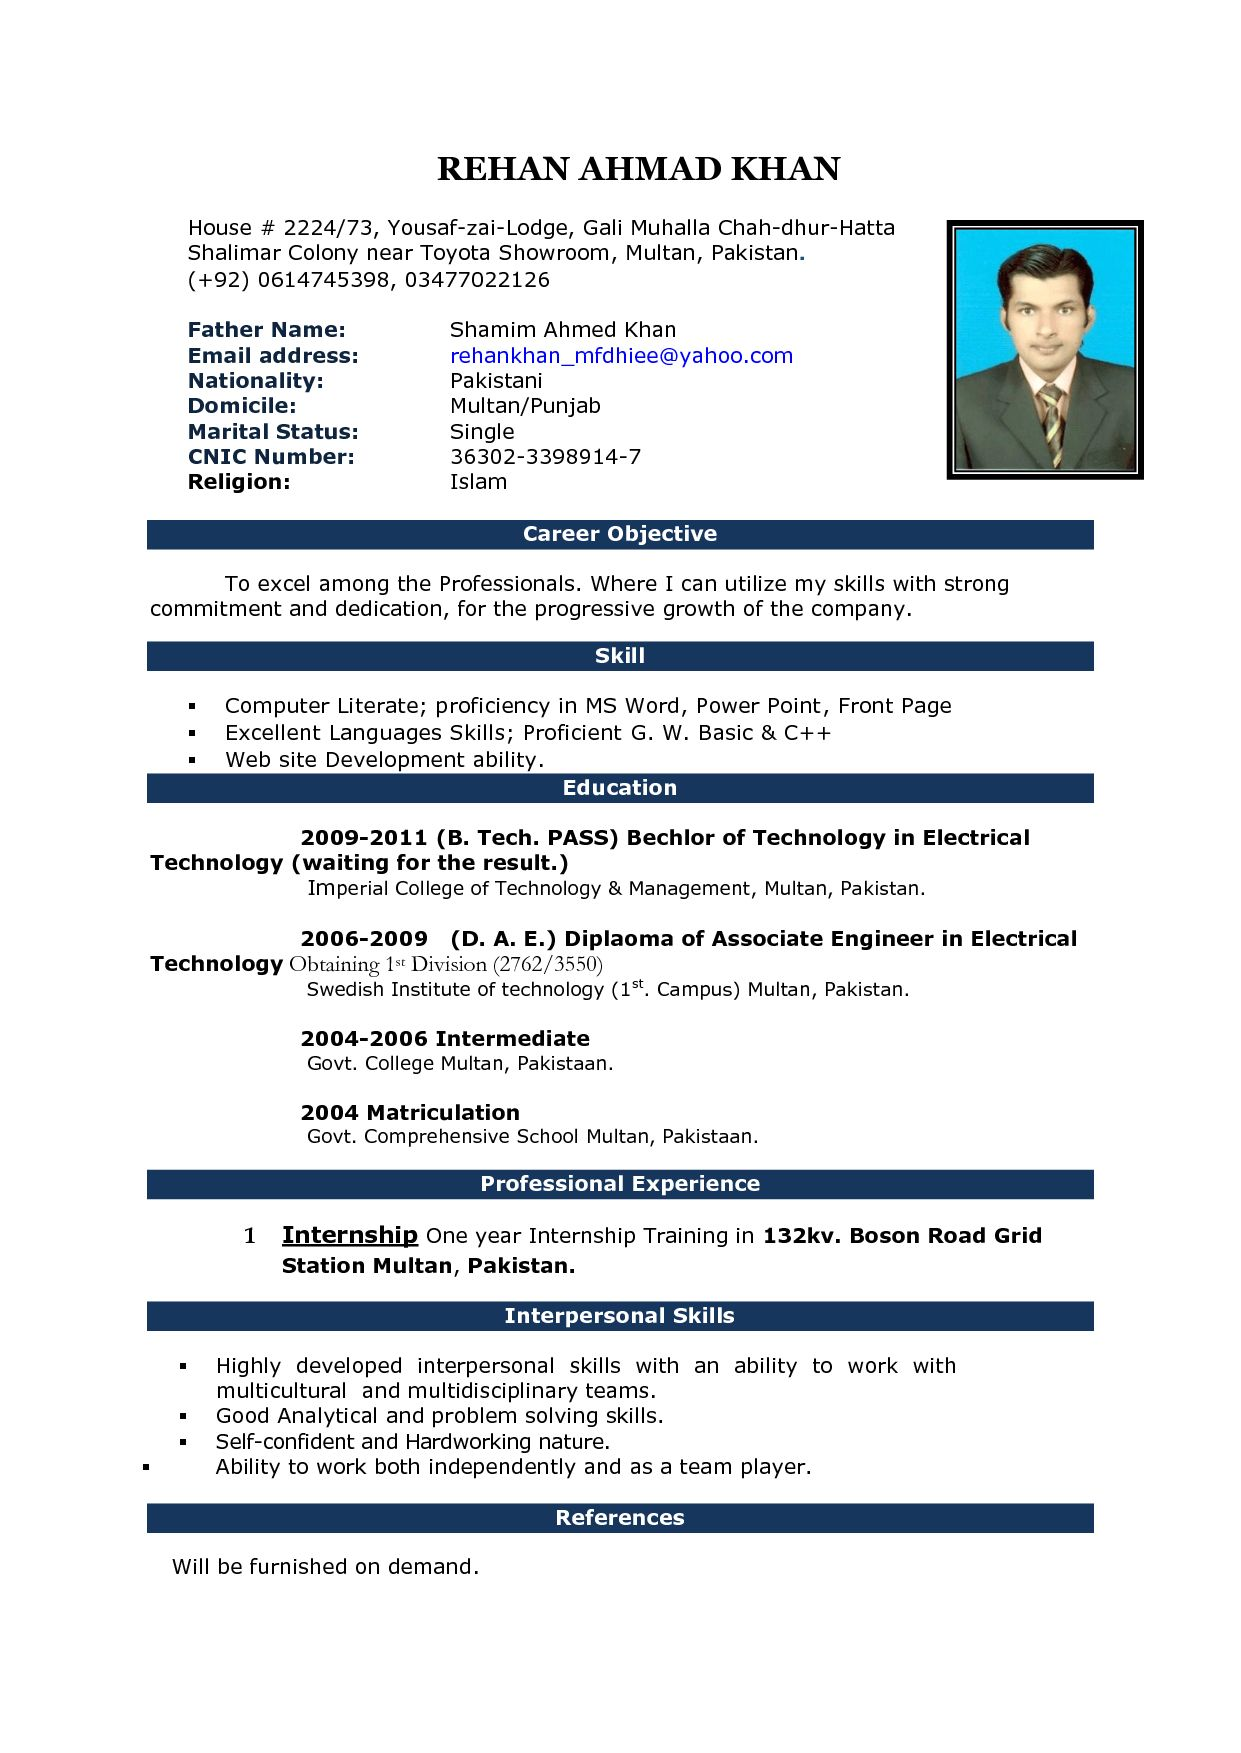 Cv Templates Microsoft Word 2010 Bolan.horizonconsulting